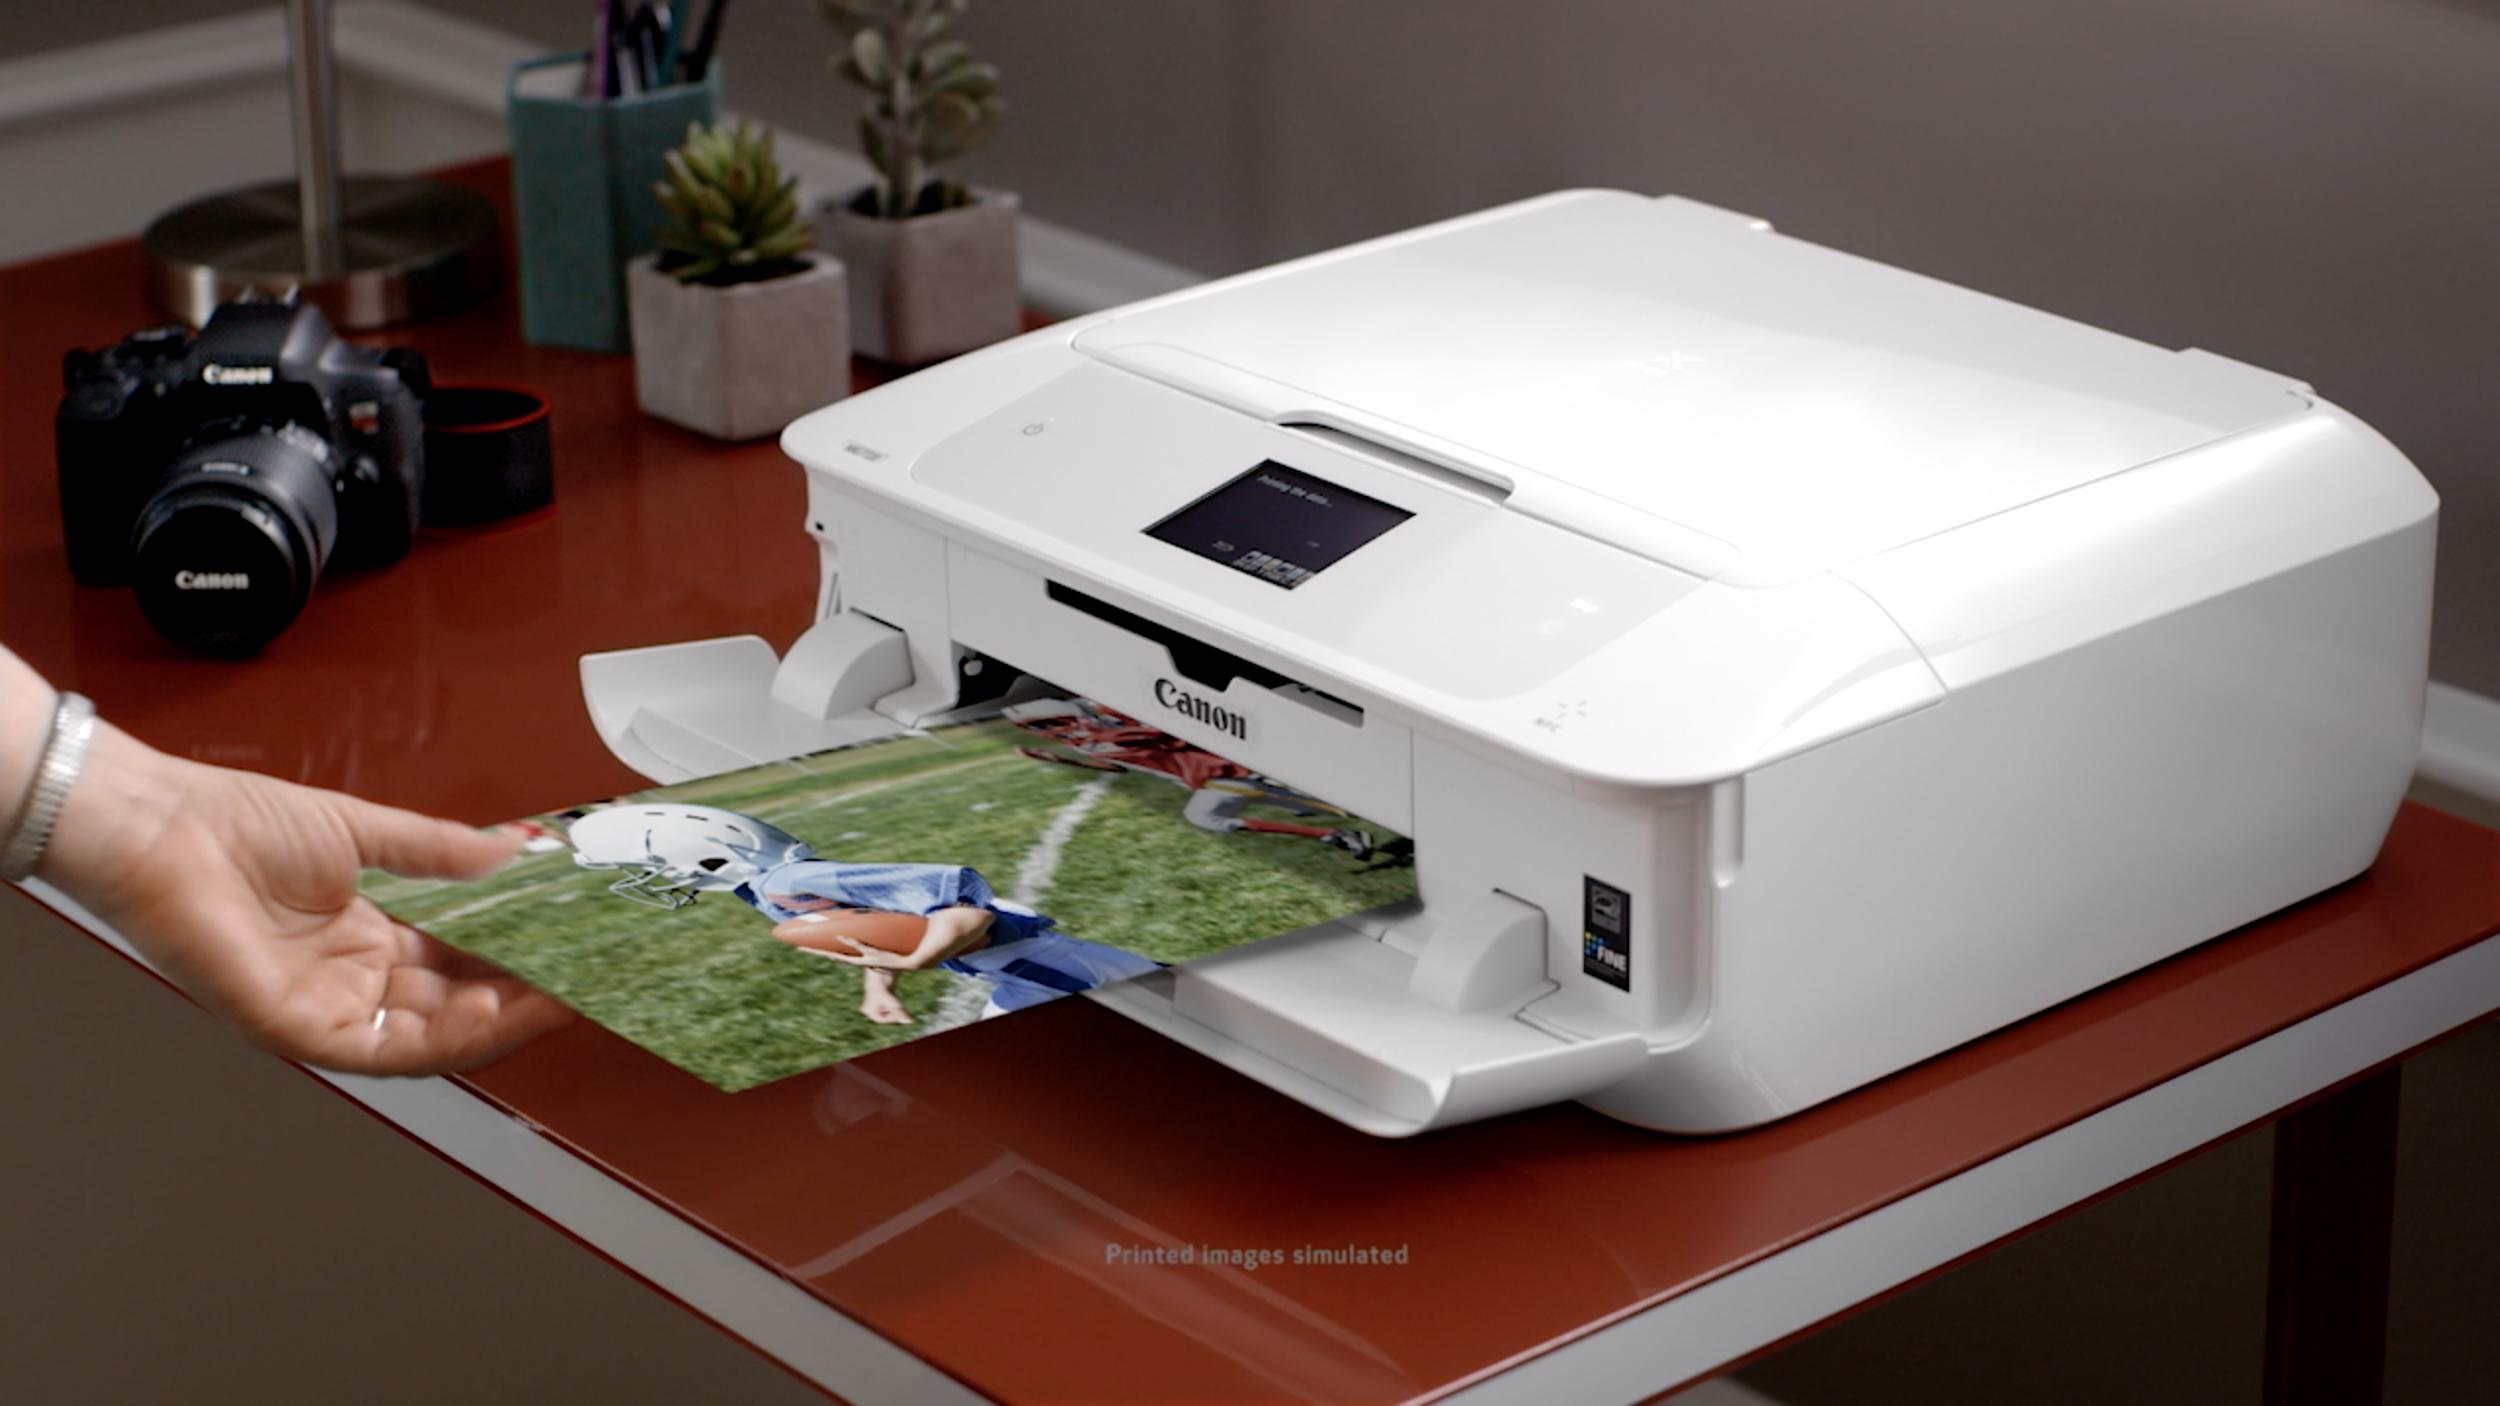 canon_pixma_neveragain_touchdown_printer.png